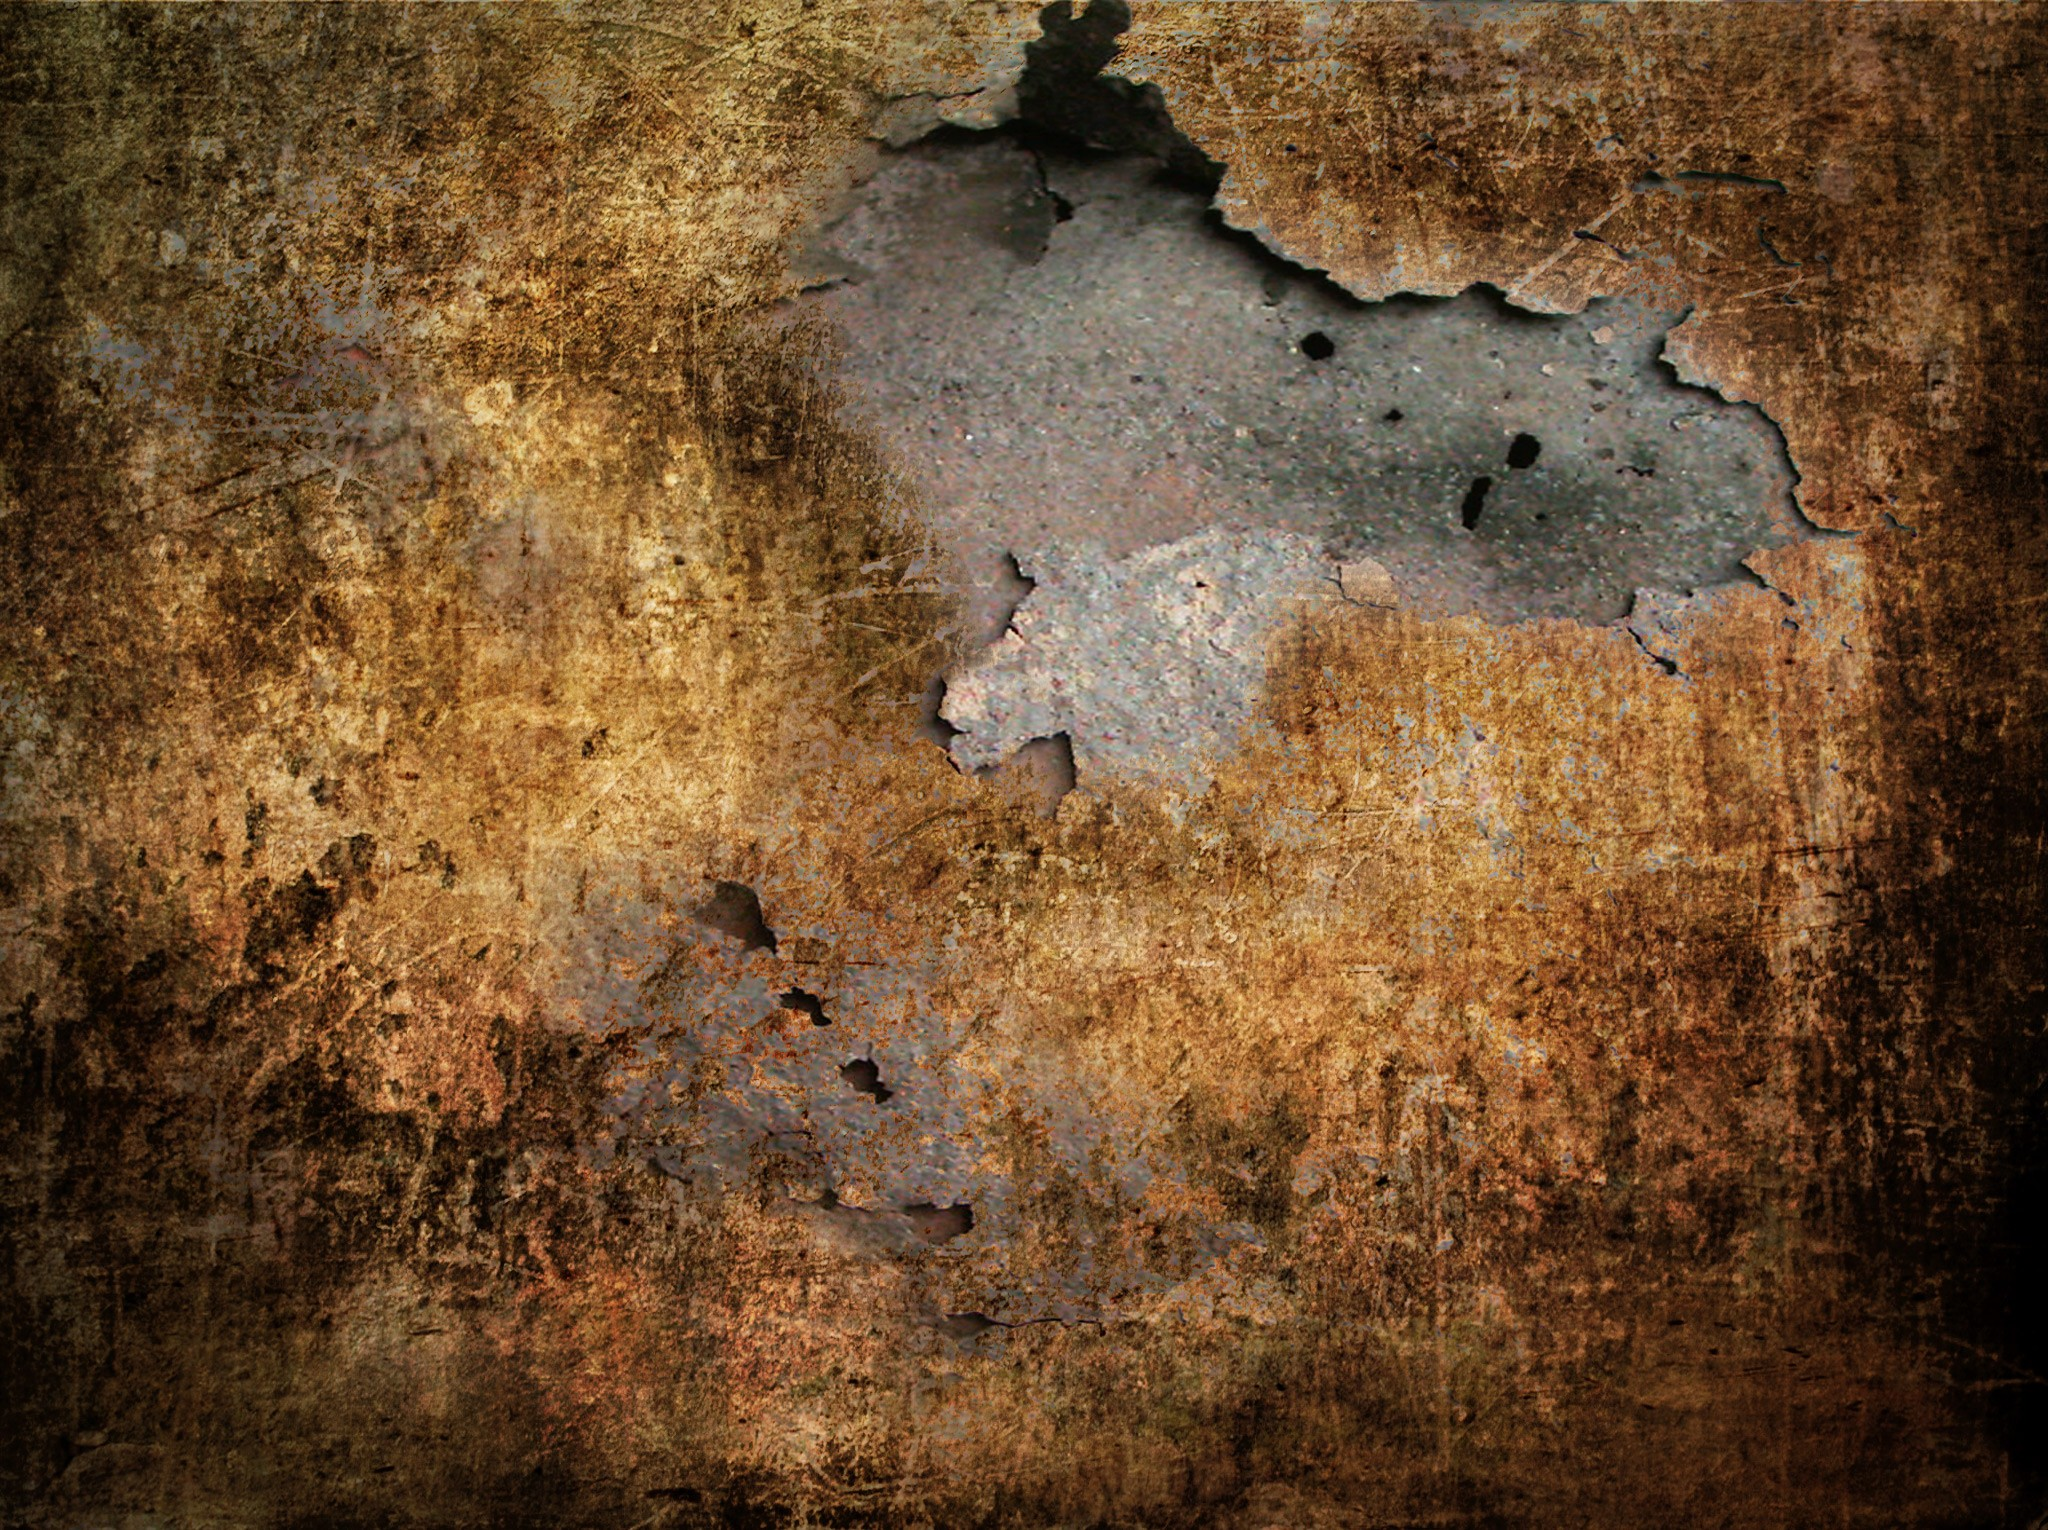 Grunge Textures Wallpaper 2048x1530 Grunge Textures 2048x1530